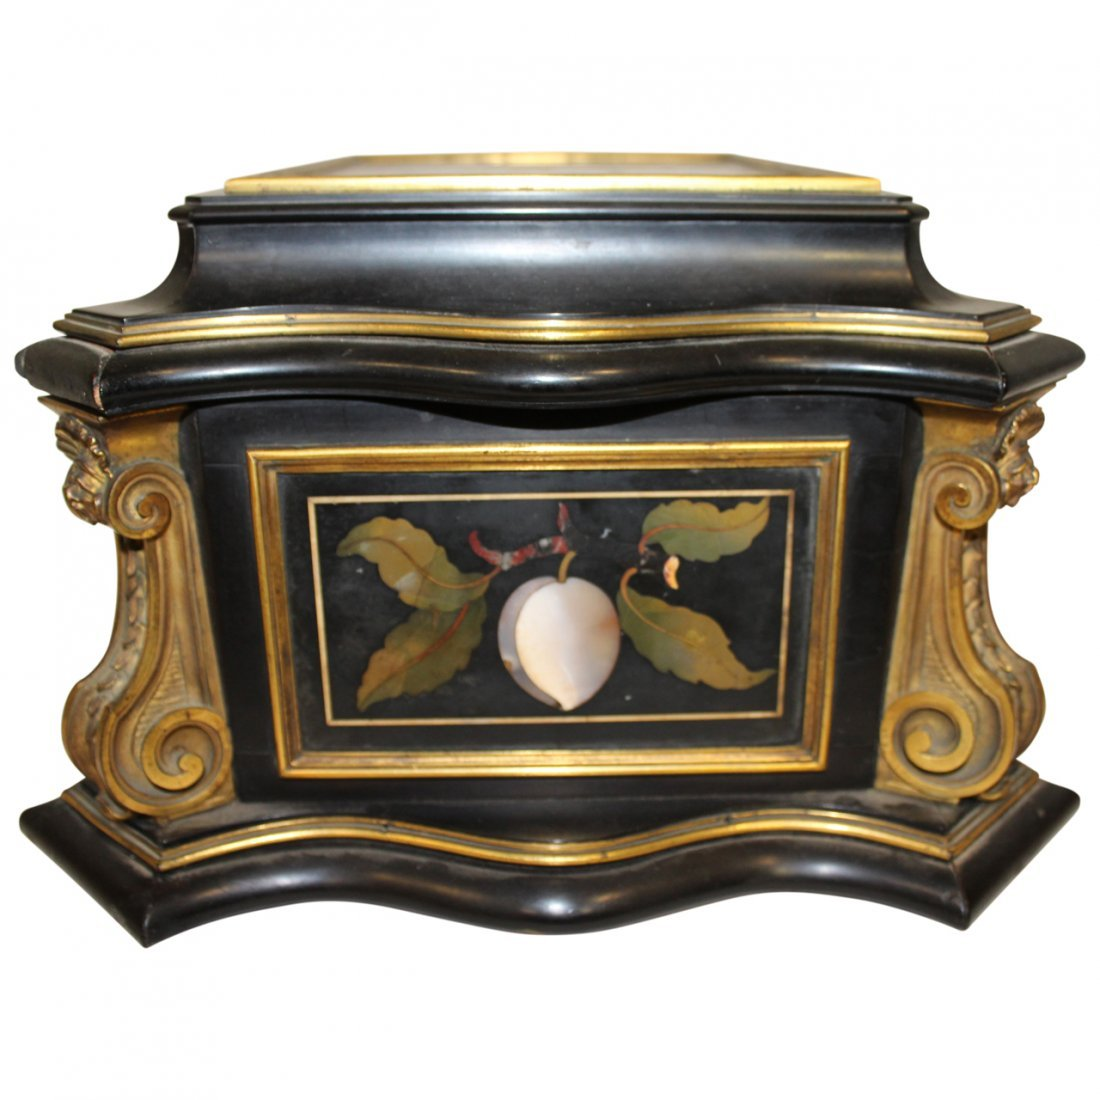 19th century Pietra Dura Casket - 2